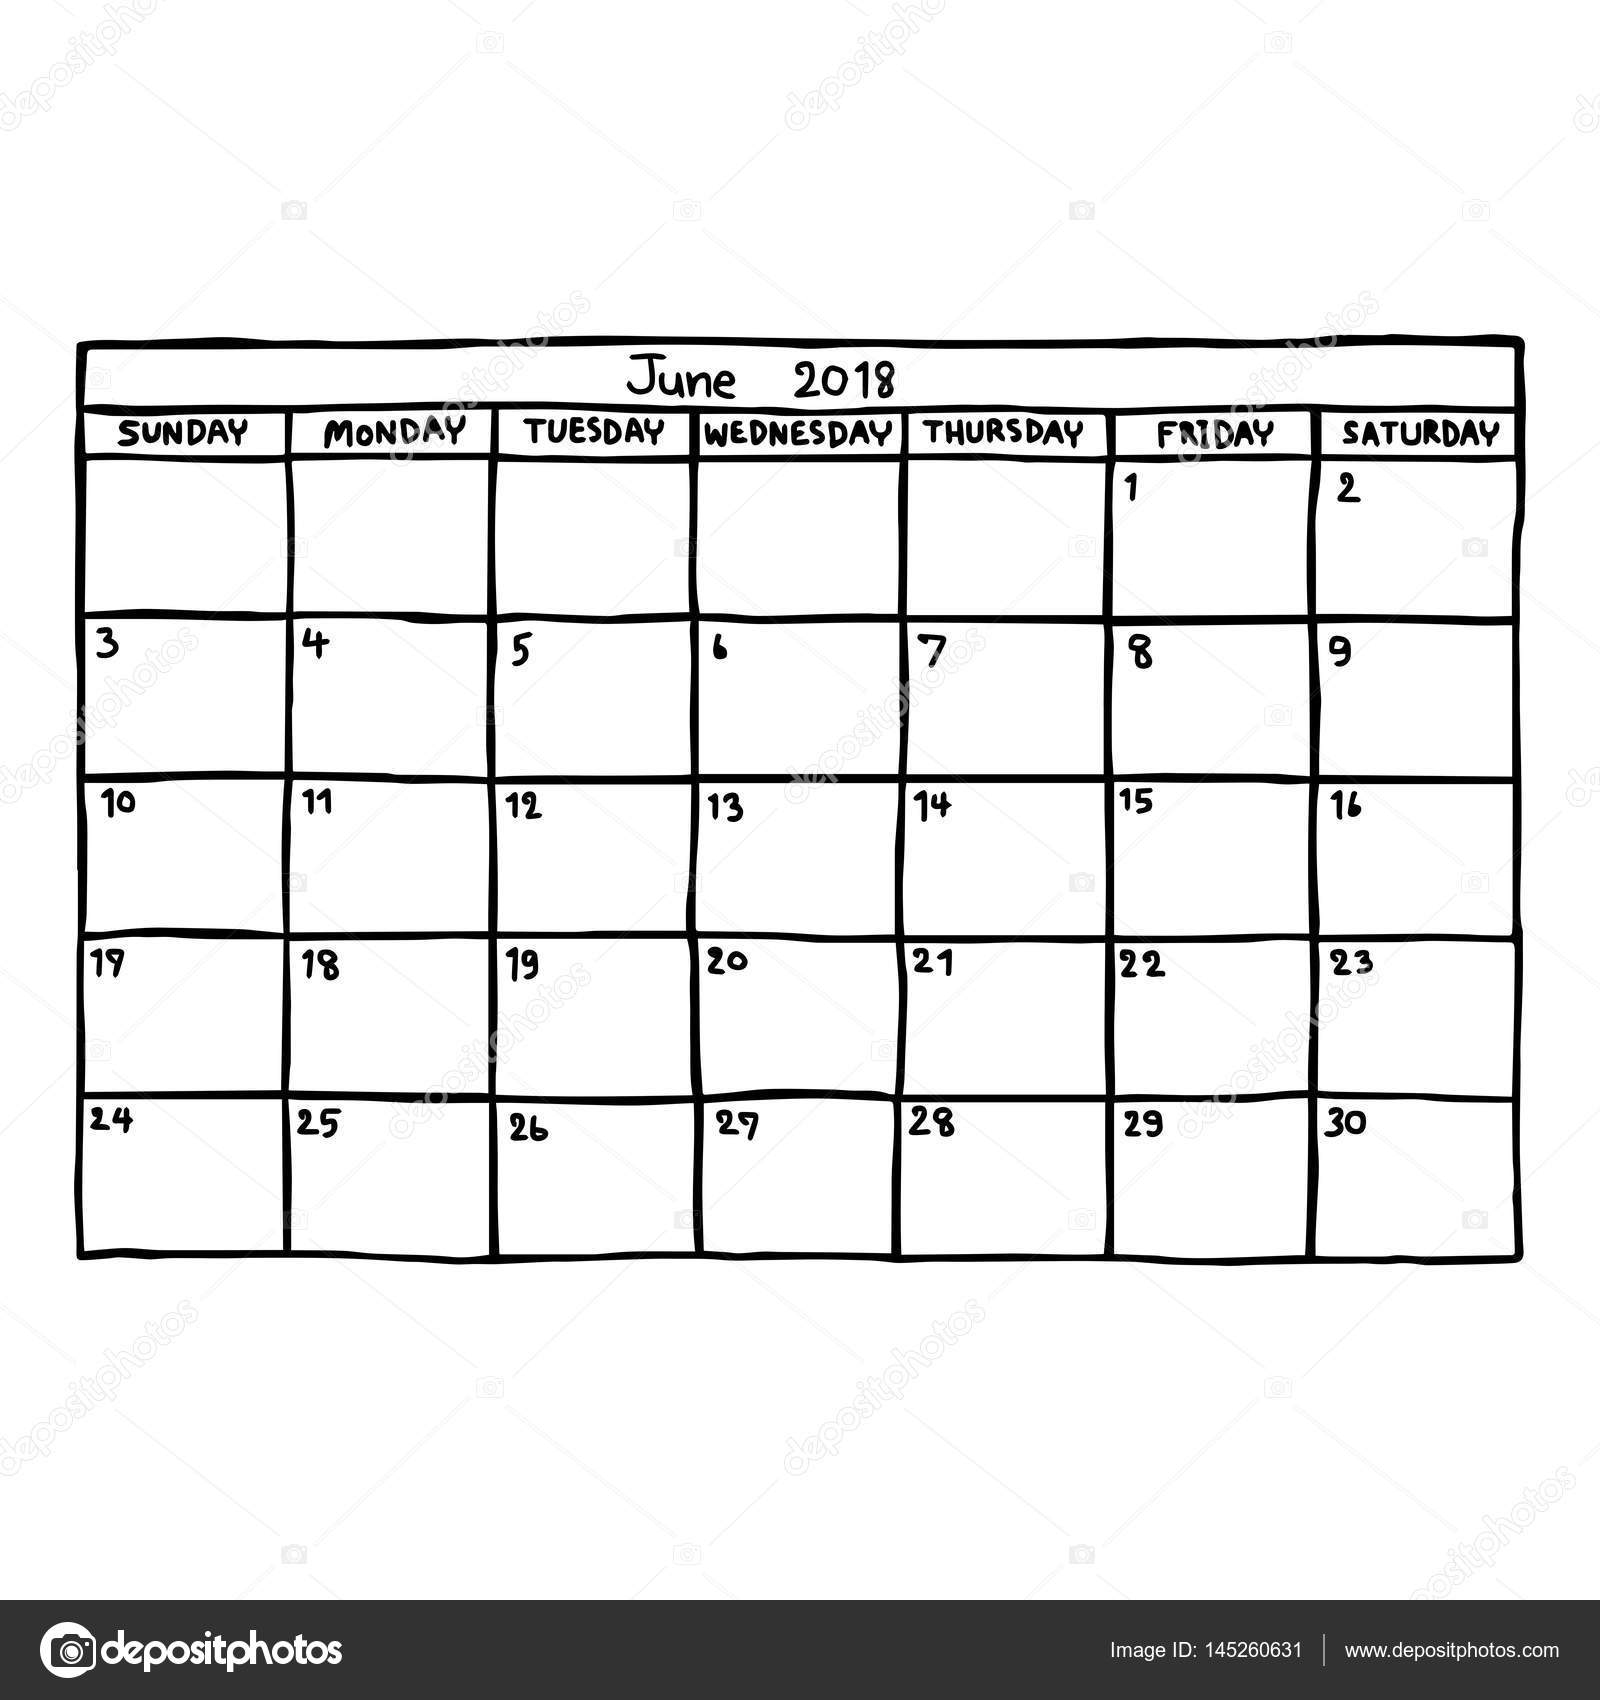 Kalender Juni 2018 - Vektor-Illustration Skizze handgezeichnete mit ...